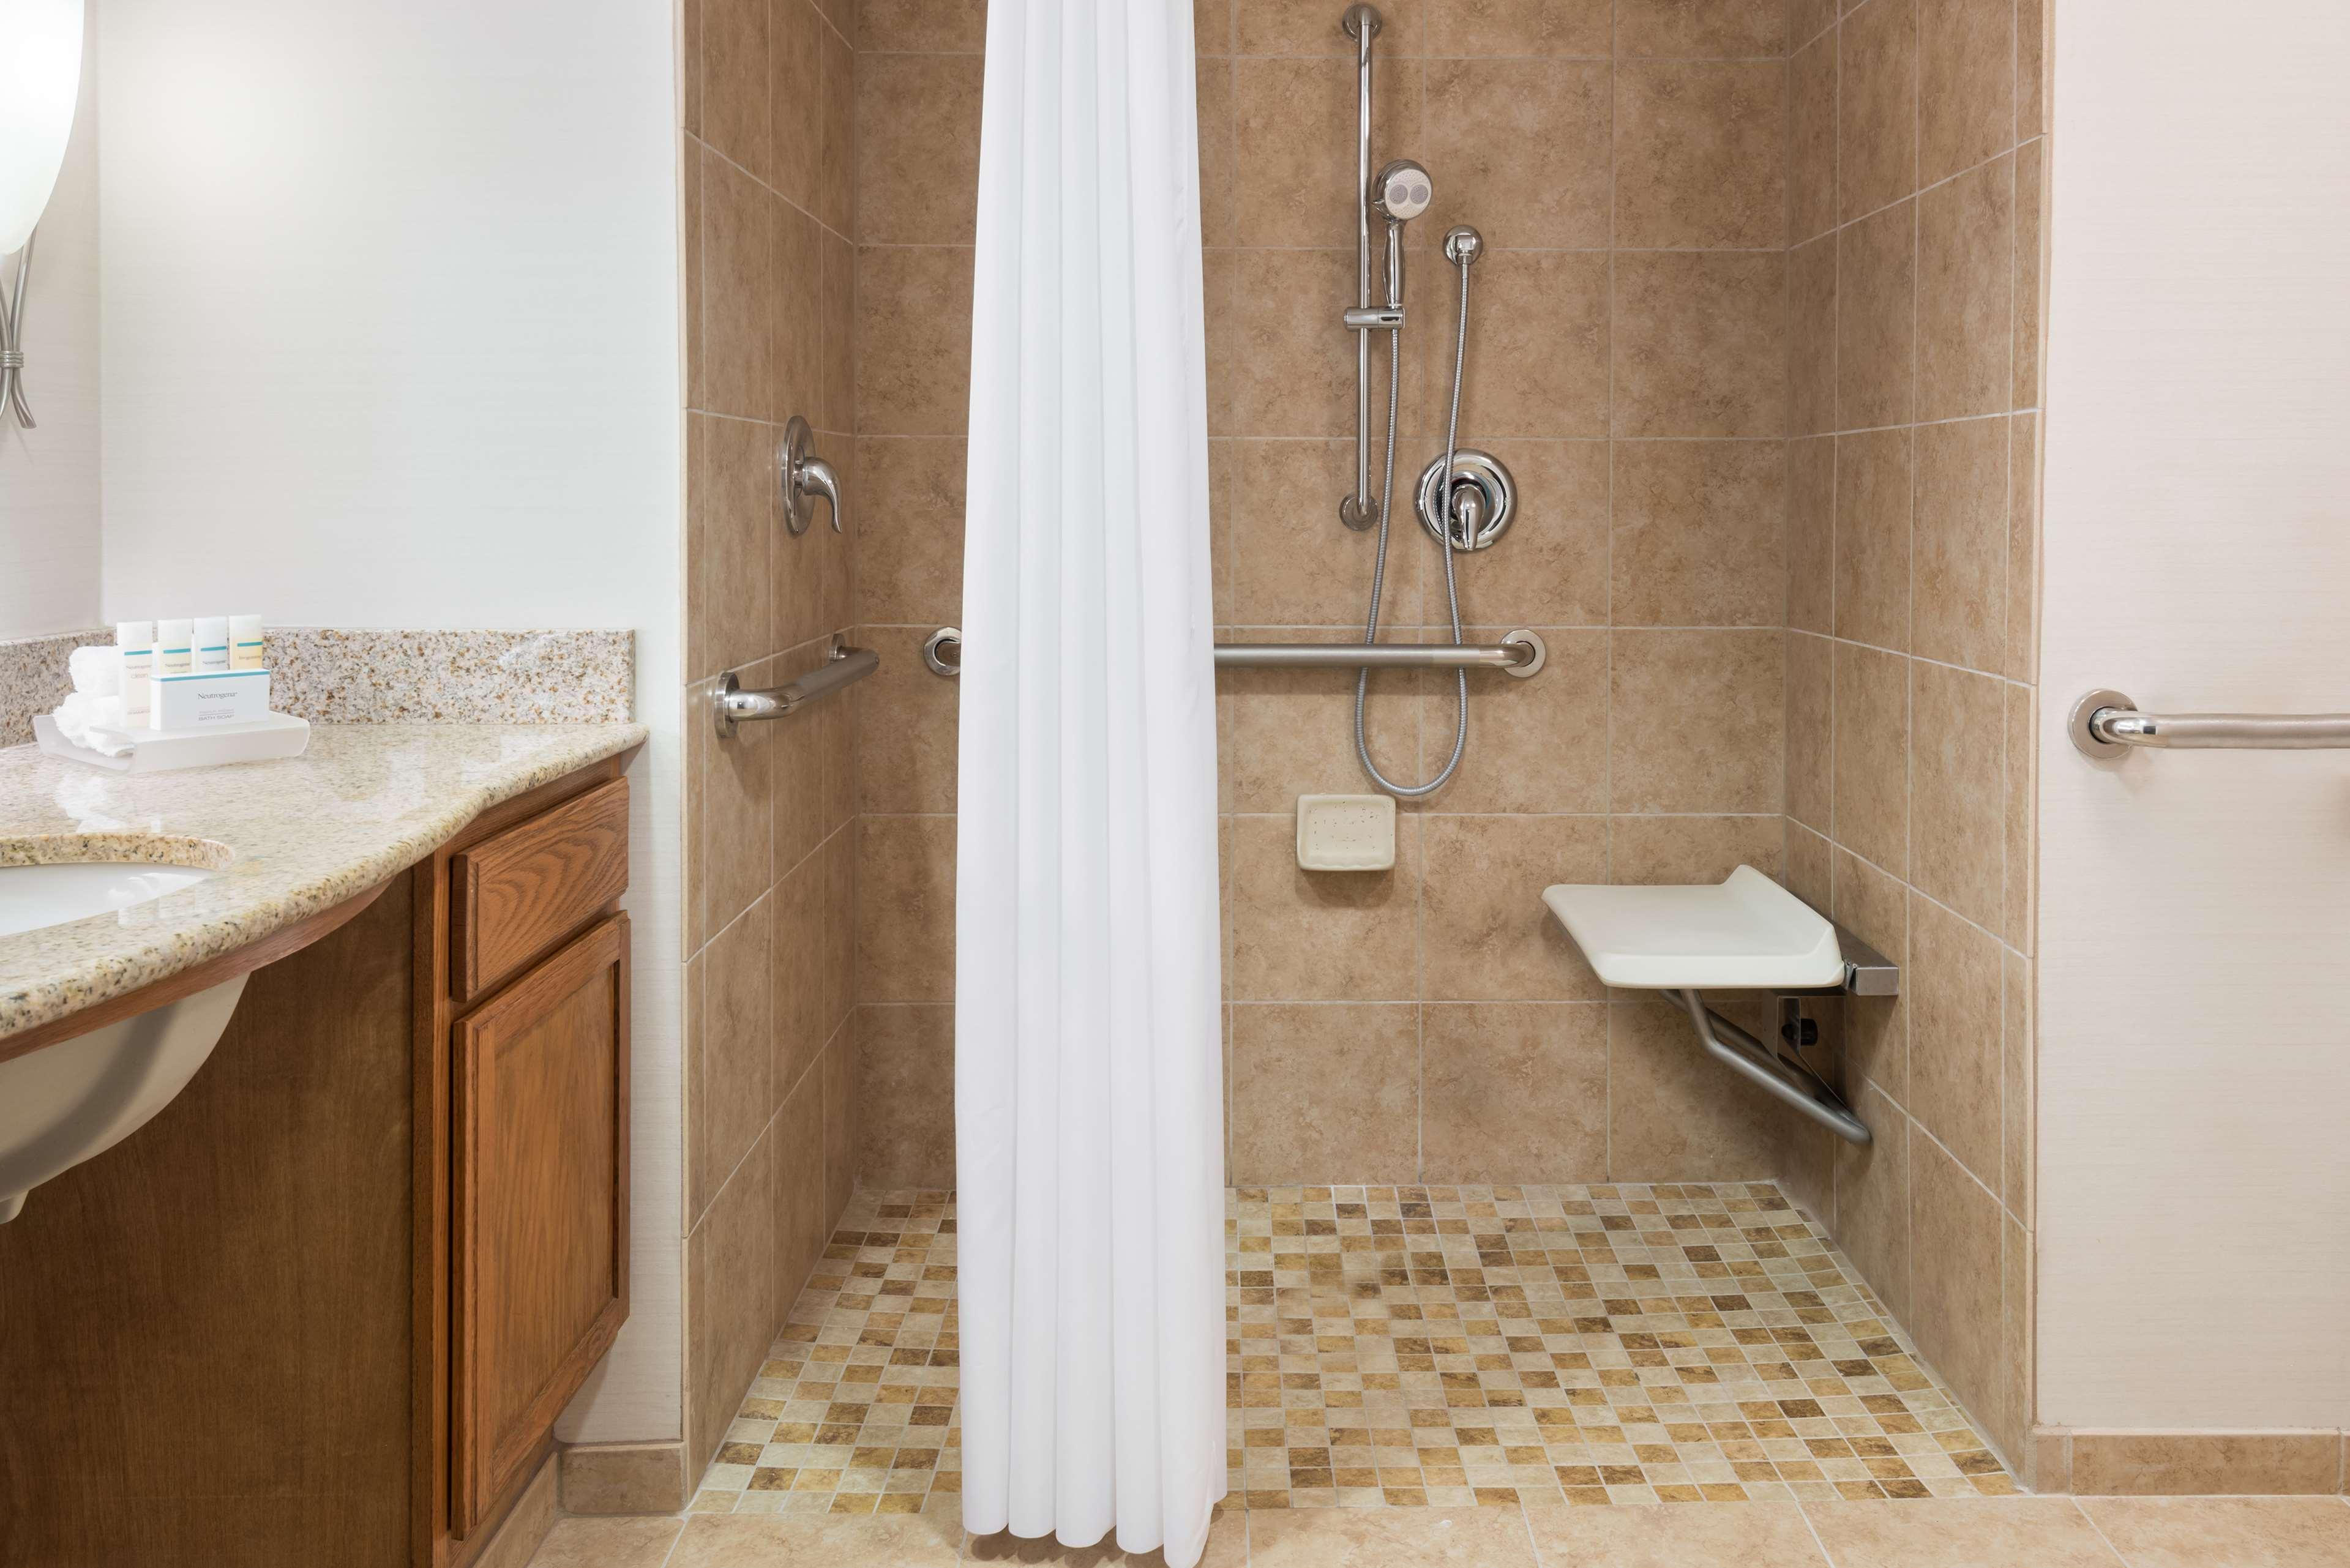 Homewood Suites by Hilton Orlando-UCF Area image 26